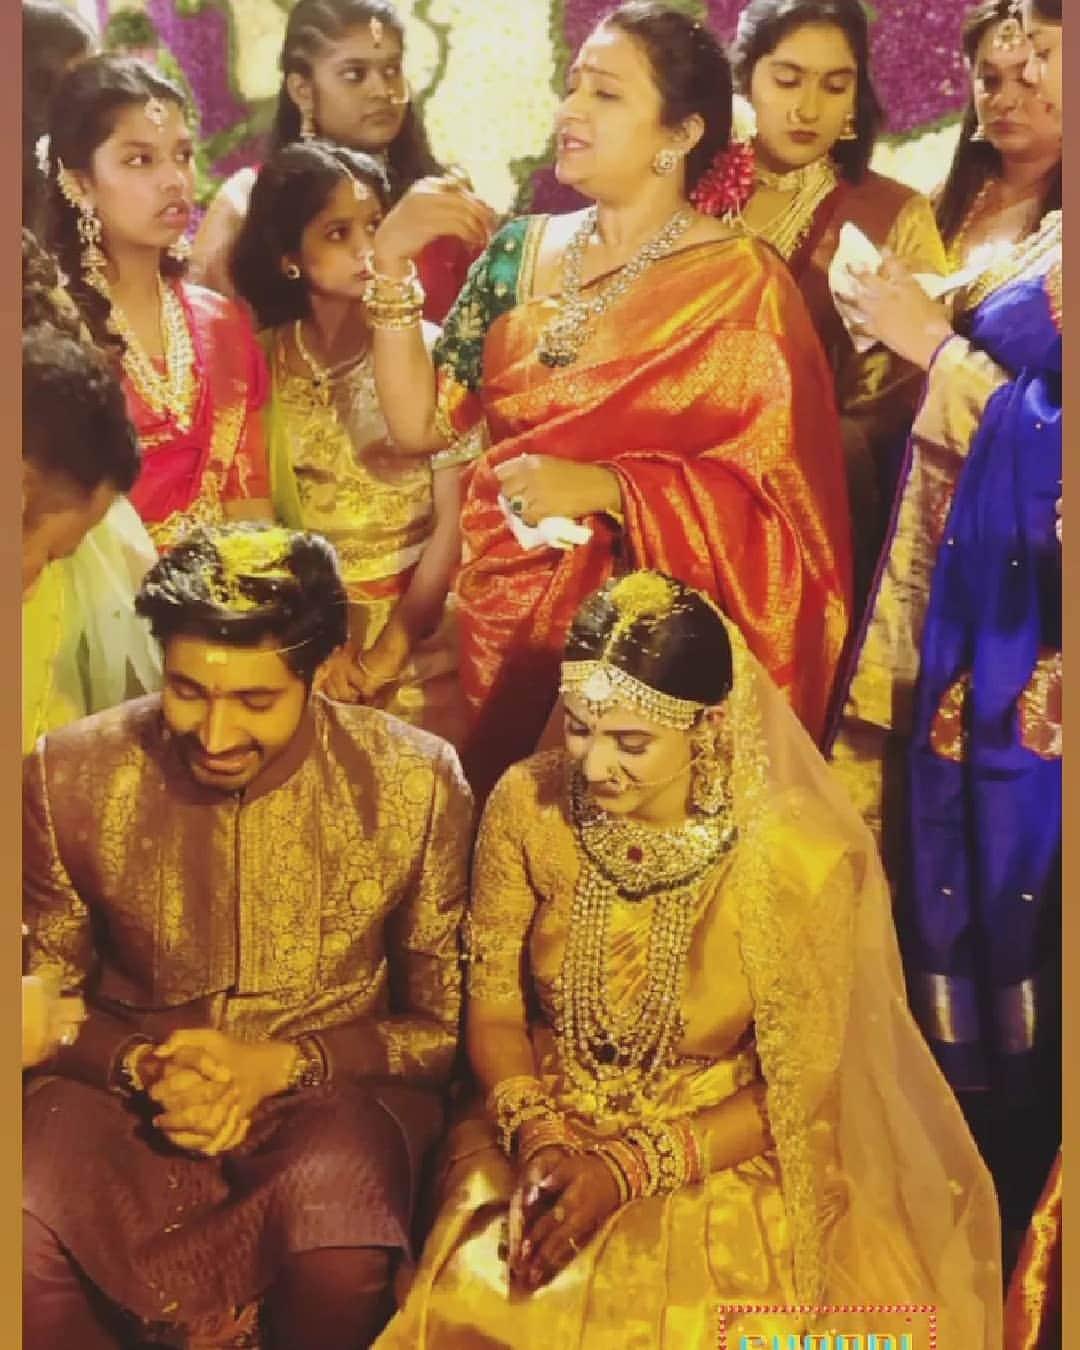 Niharika Konidela Wedding Pics : నిహారిక కొణిదెల-చైతన్య జొన్నలగడ్డ పెళ్లి ఫోటోలు.. Photo : Instagram